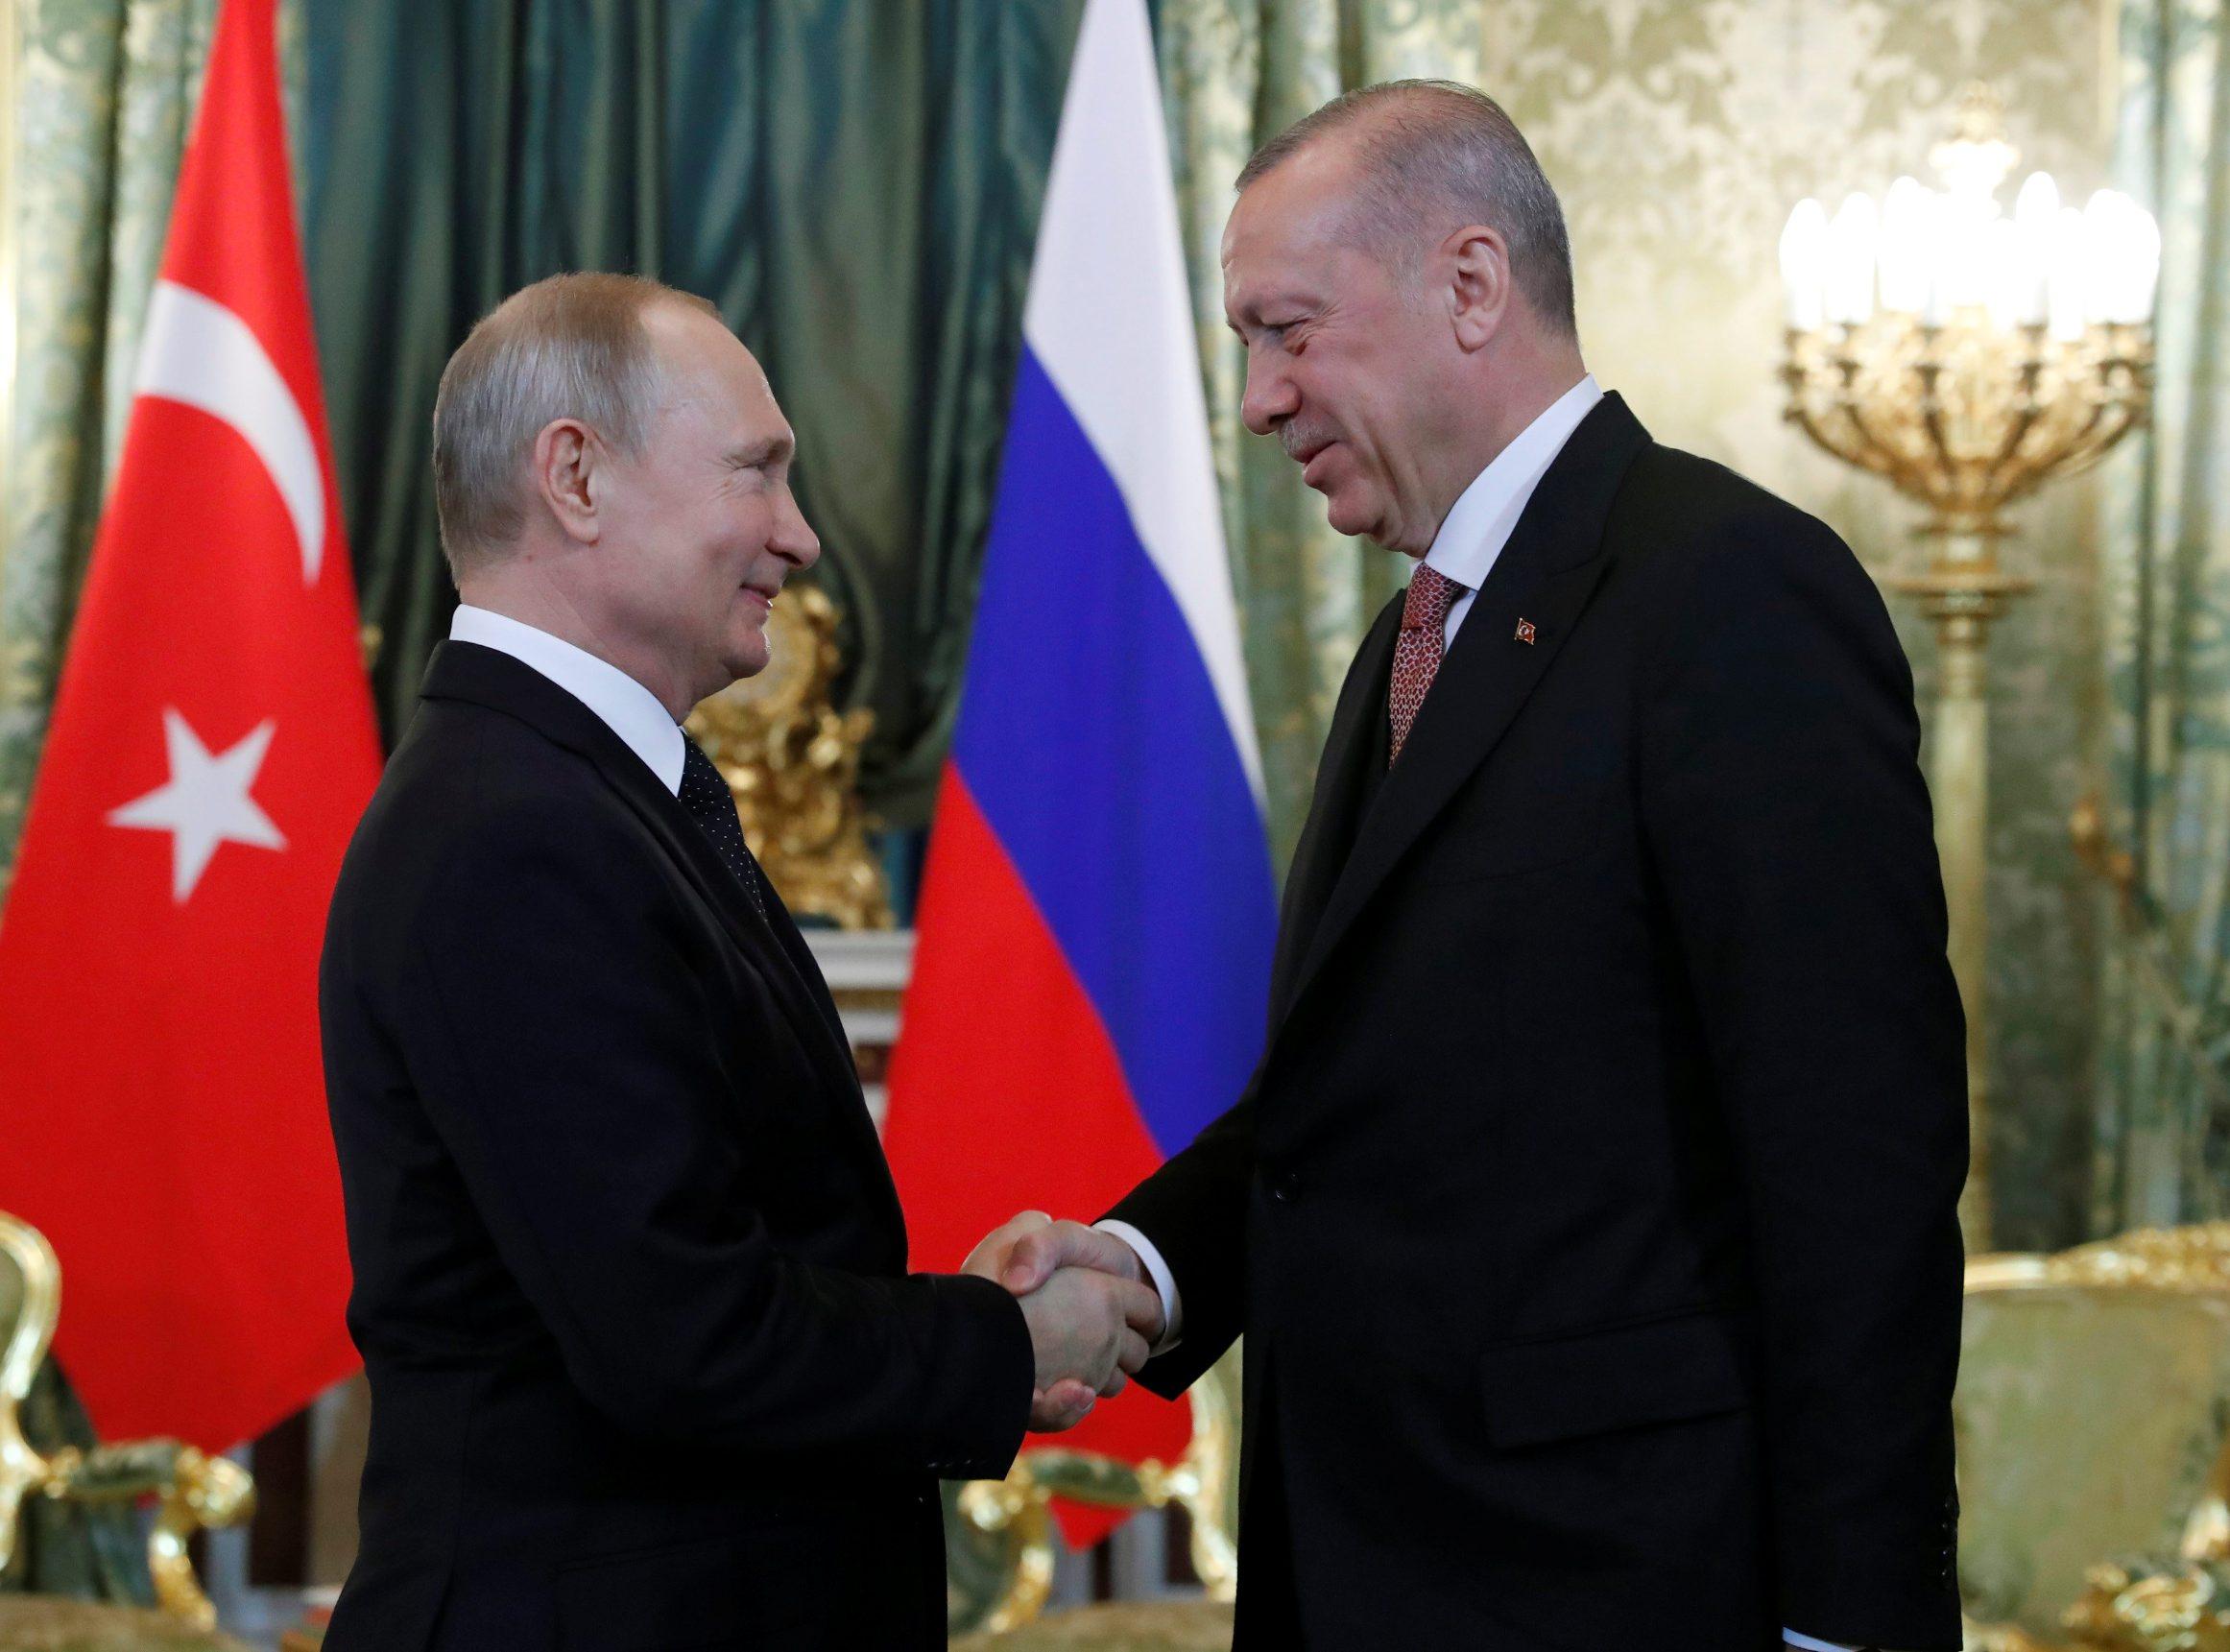 2019-04-08T121814Z_1859372257_RC12E7B25DA0_RTRMADP_3_RUSSIA-TURKEY